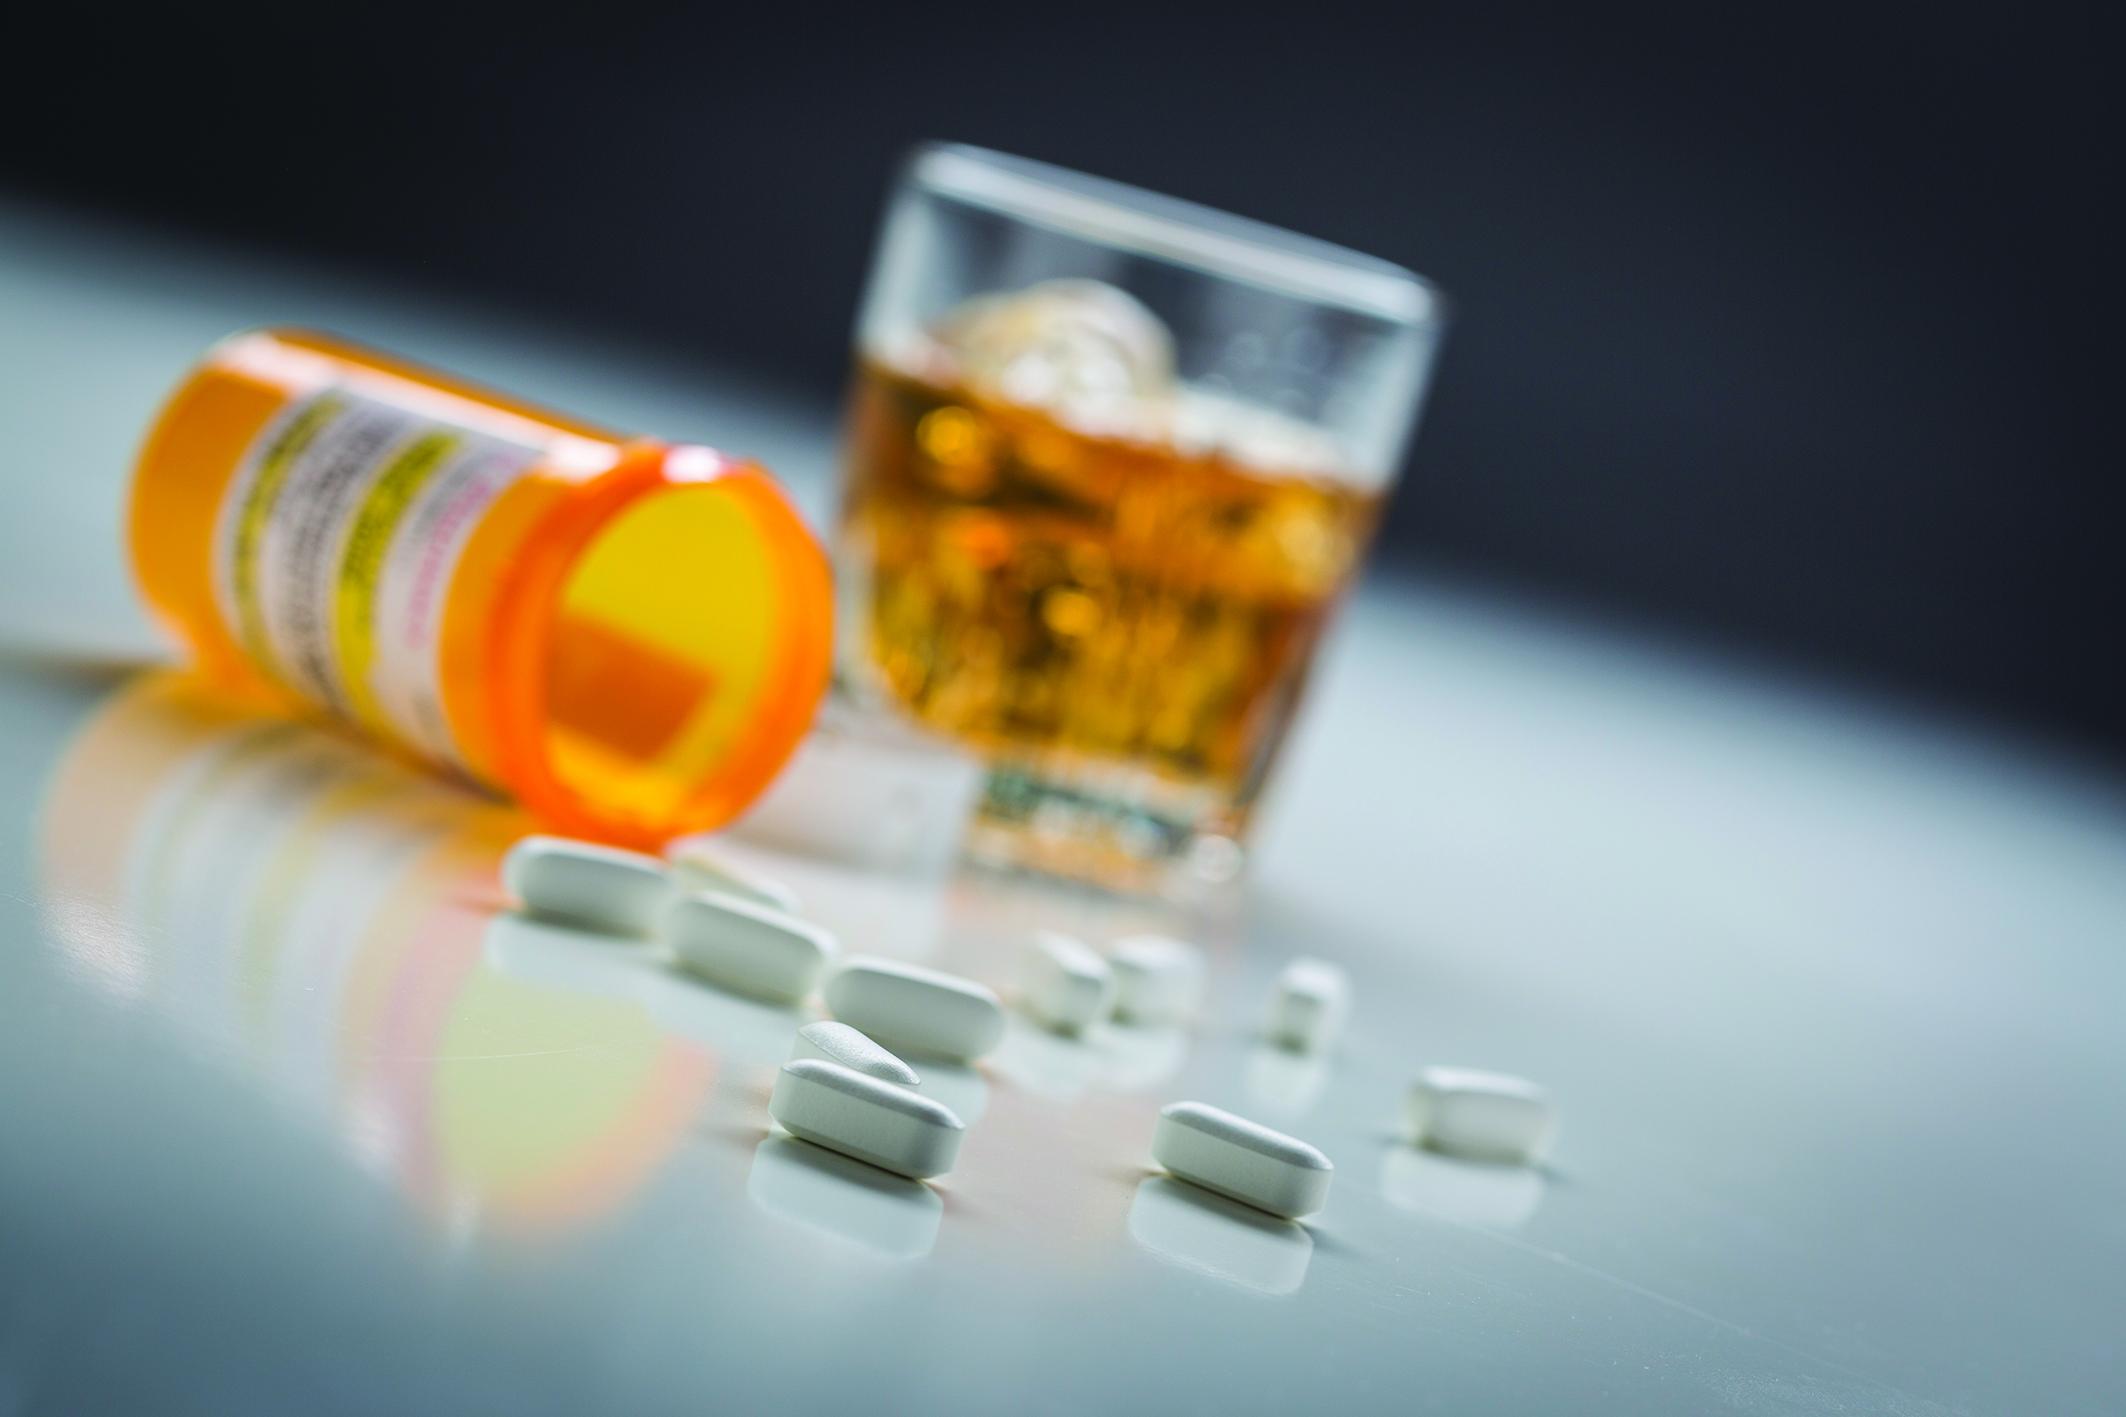 Marfarin tabletta